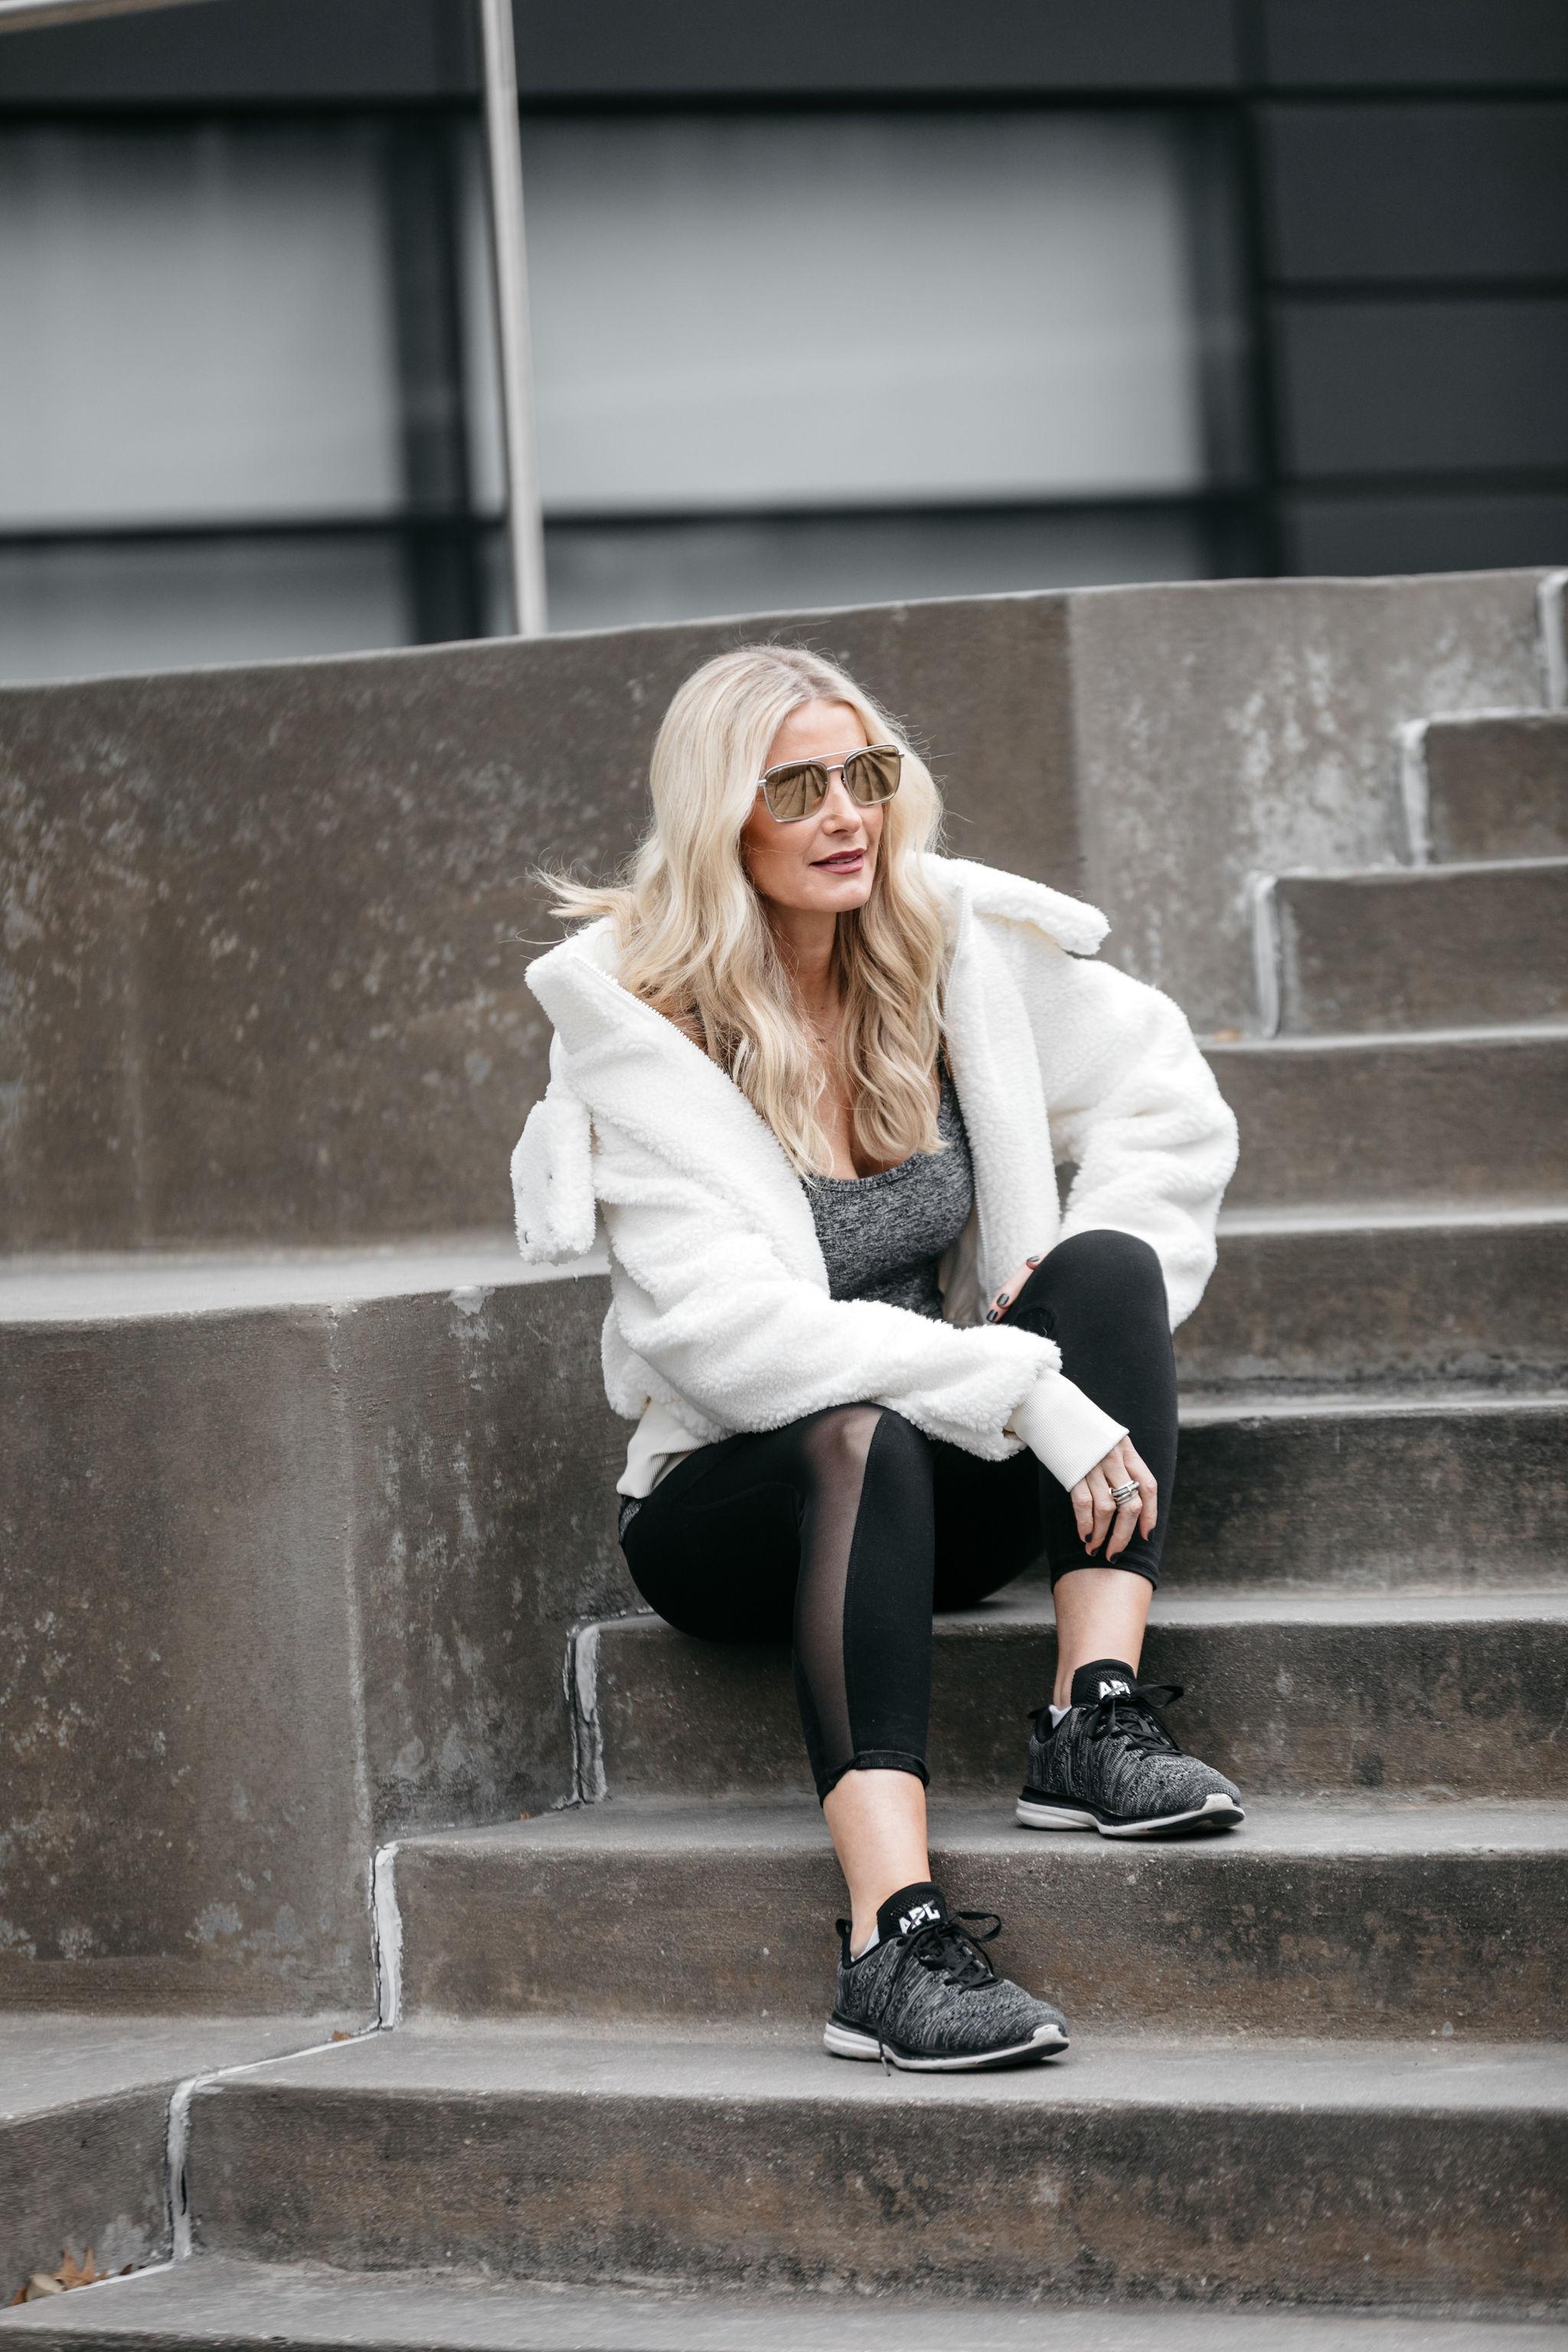 Dallas fitness blogger wearing teddy coat and black leggings